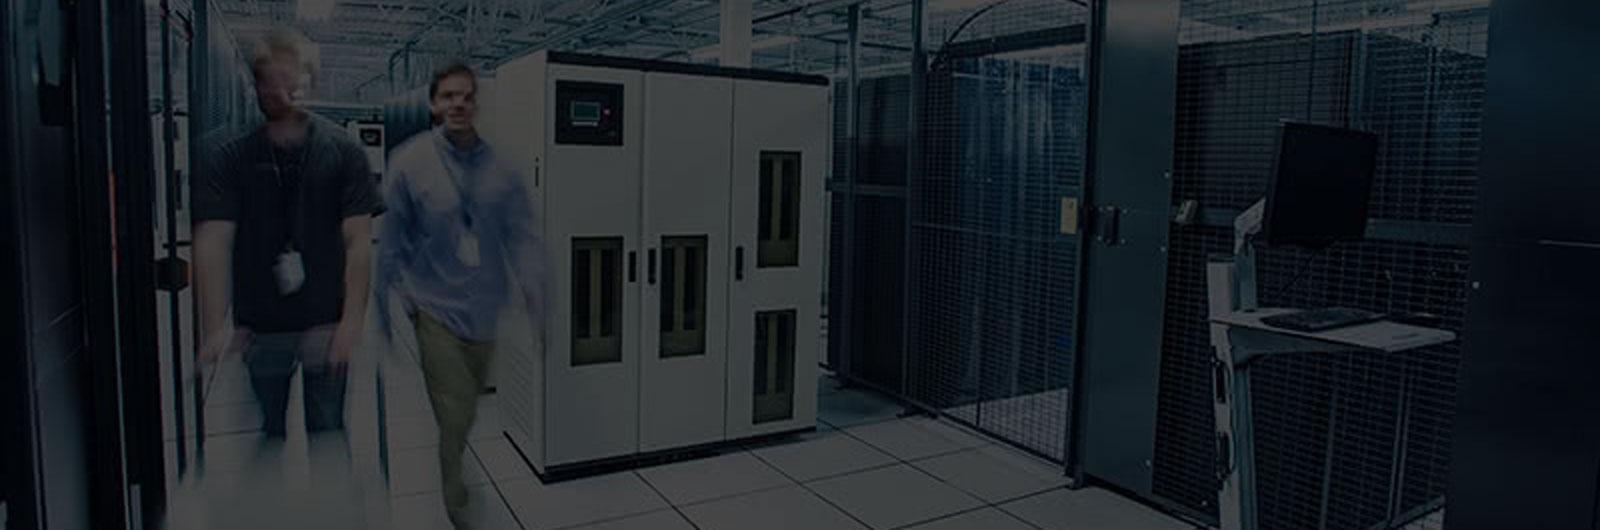 Reducer driftsomkostninger med ny køleløsning til datacentre